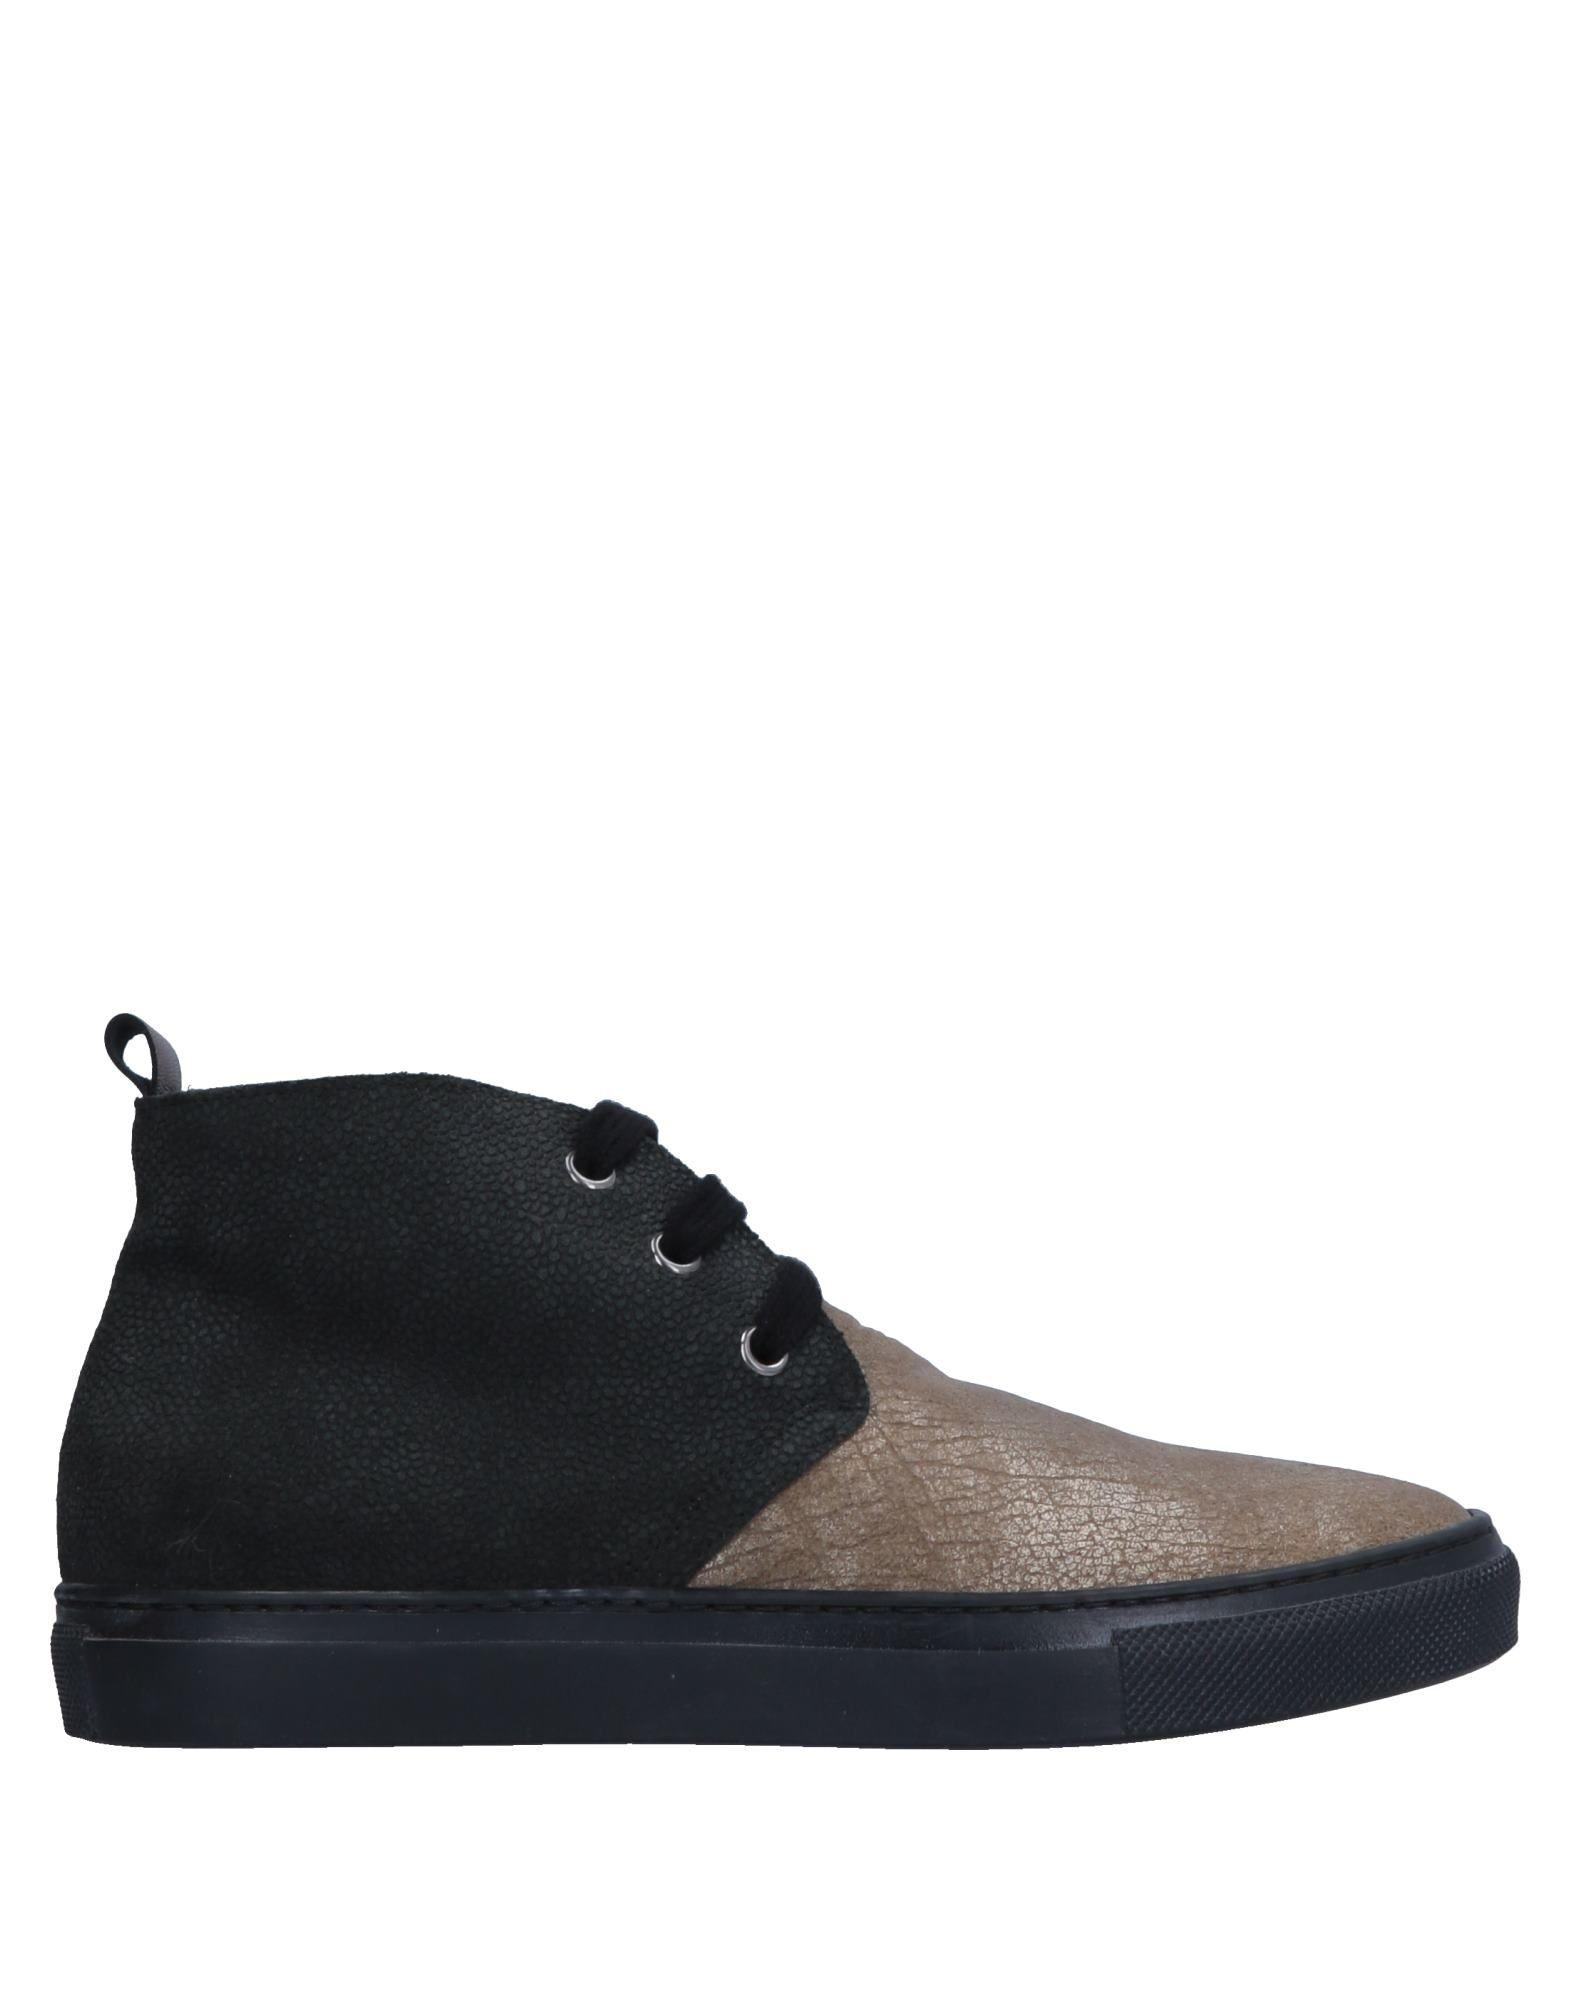 Ebarrito Boot Ankle Boot Ebarrito - Women Ebarrito Ankle Boots online on  United Kingdom - 11547957GK 481173